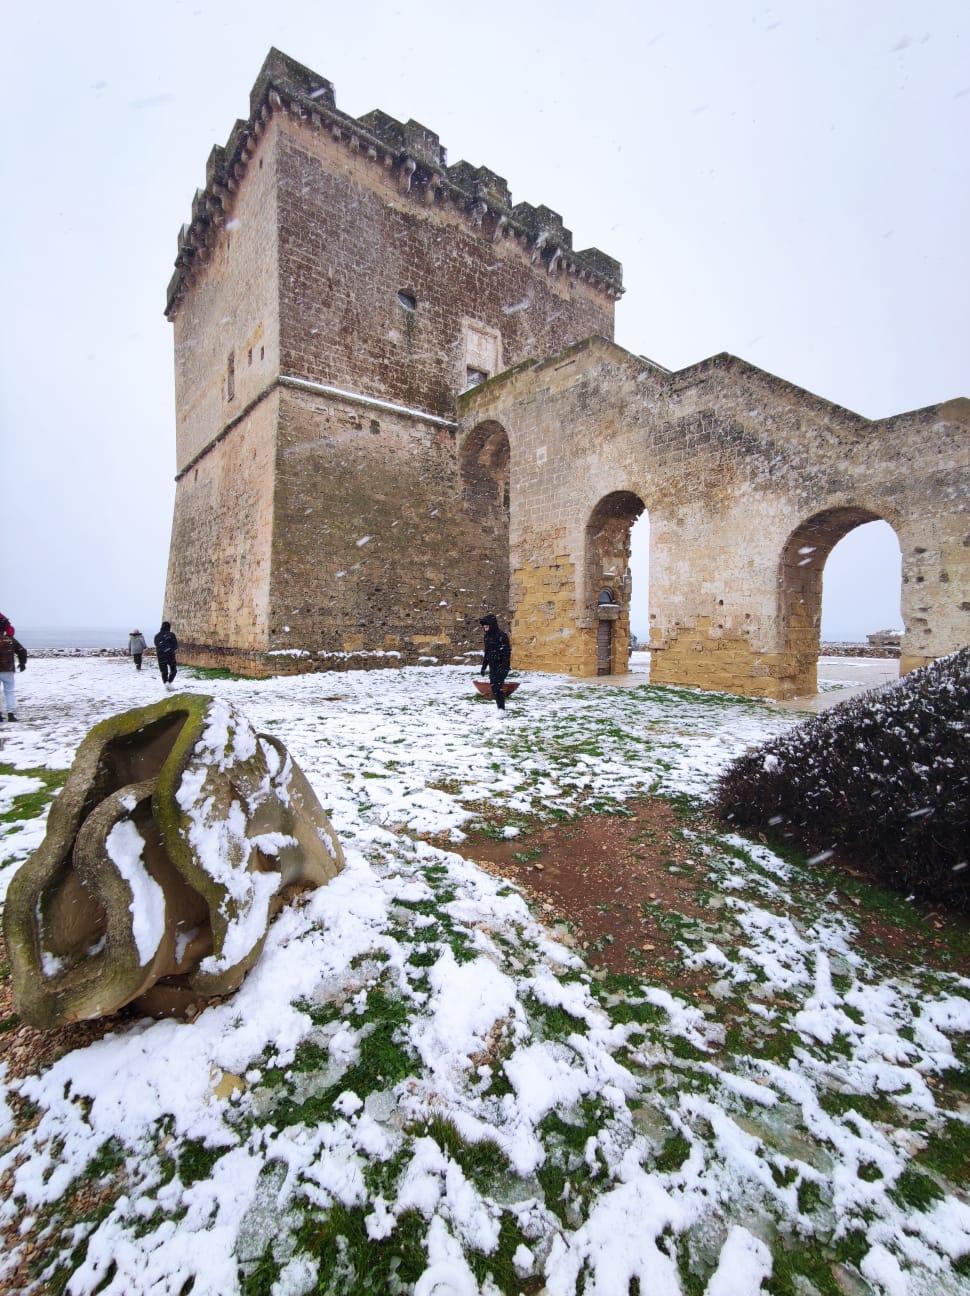 [video] – Aria gelida dai Balcani, la neve imbianca Porto Cesareo